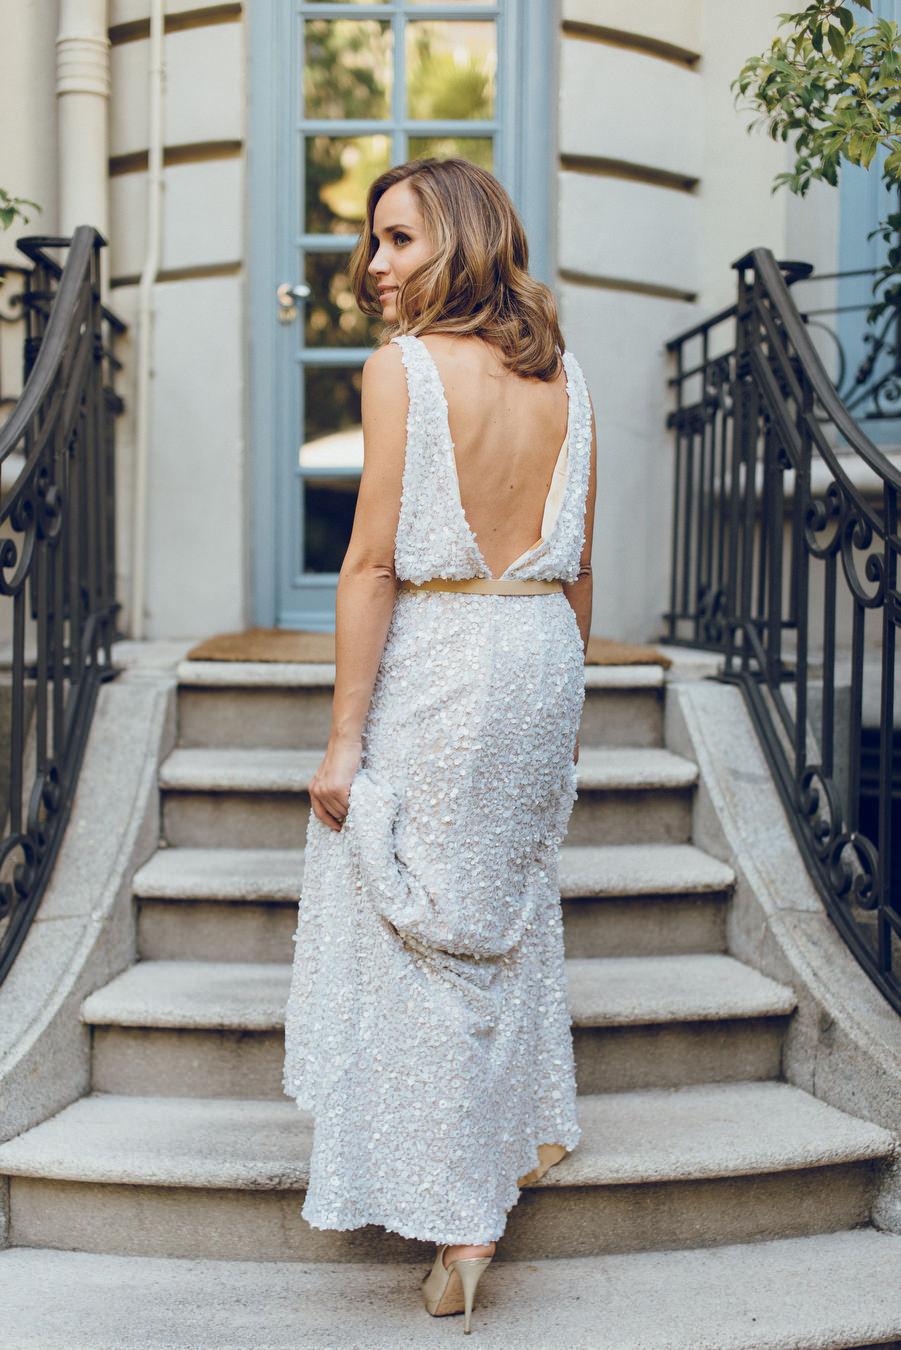 calista-one-lista-de-bodas-online-blog-de-bodas-bossanova-looks-invitadas-pepe-botella-3